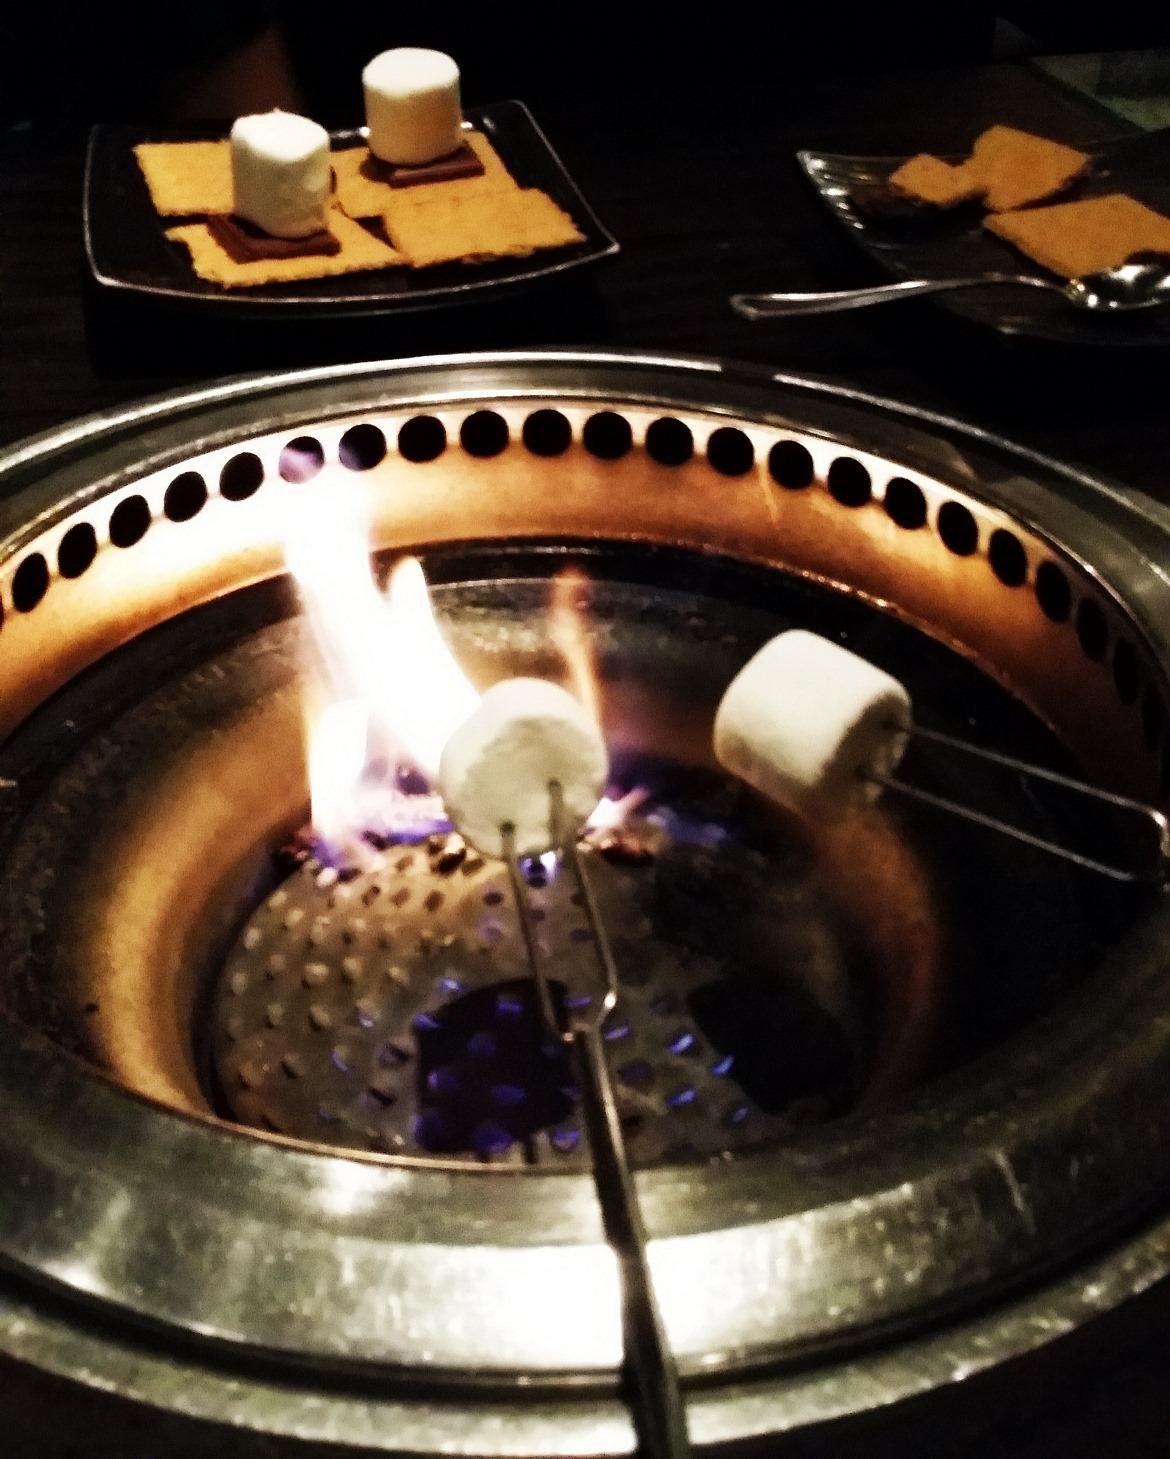 Burning smores - New York New York, travel blog by BeckyBecky Blogs